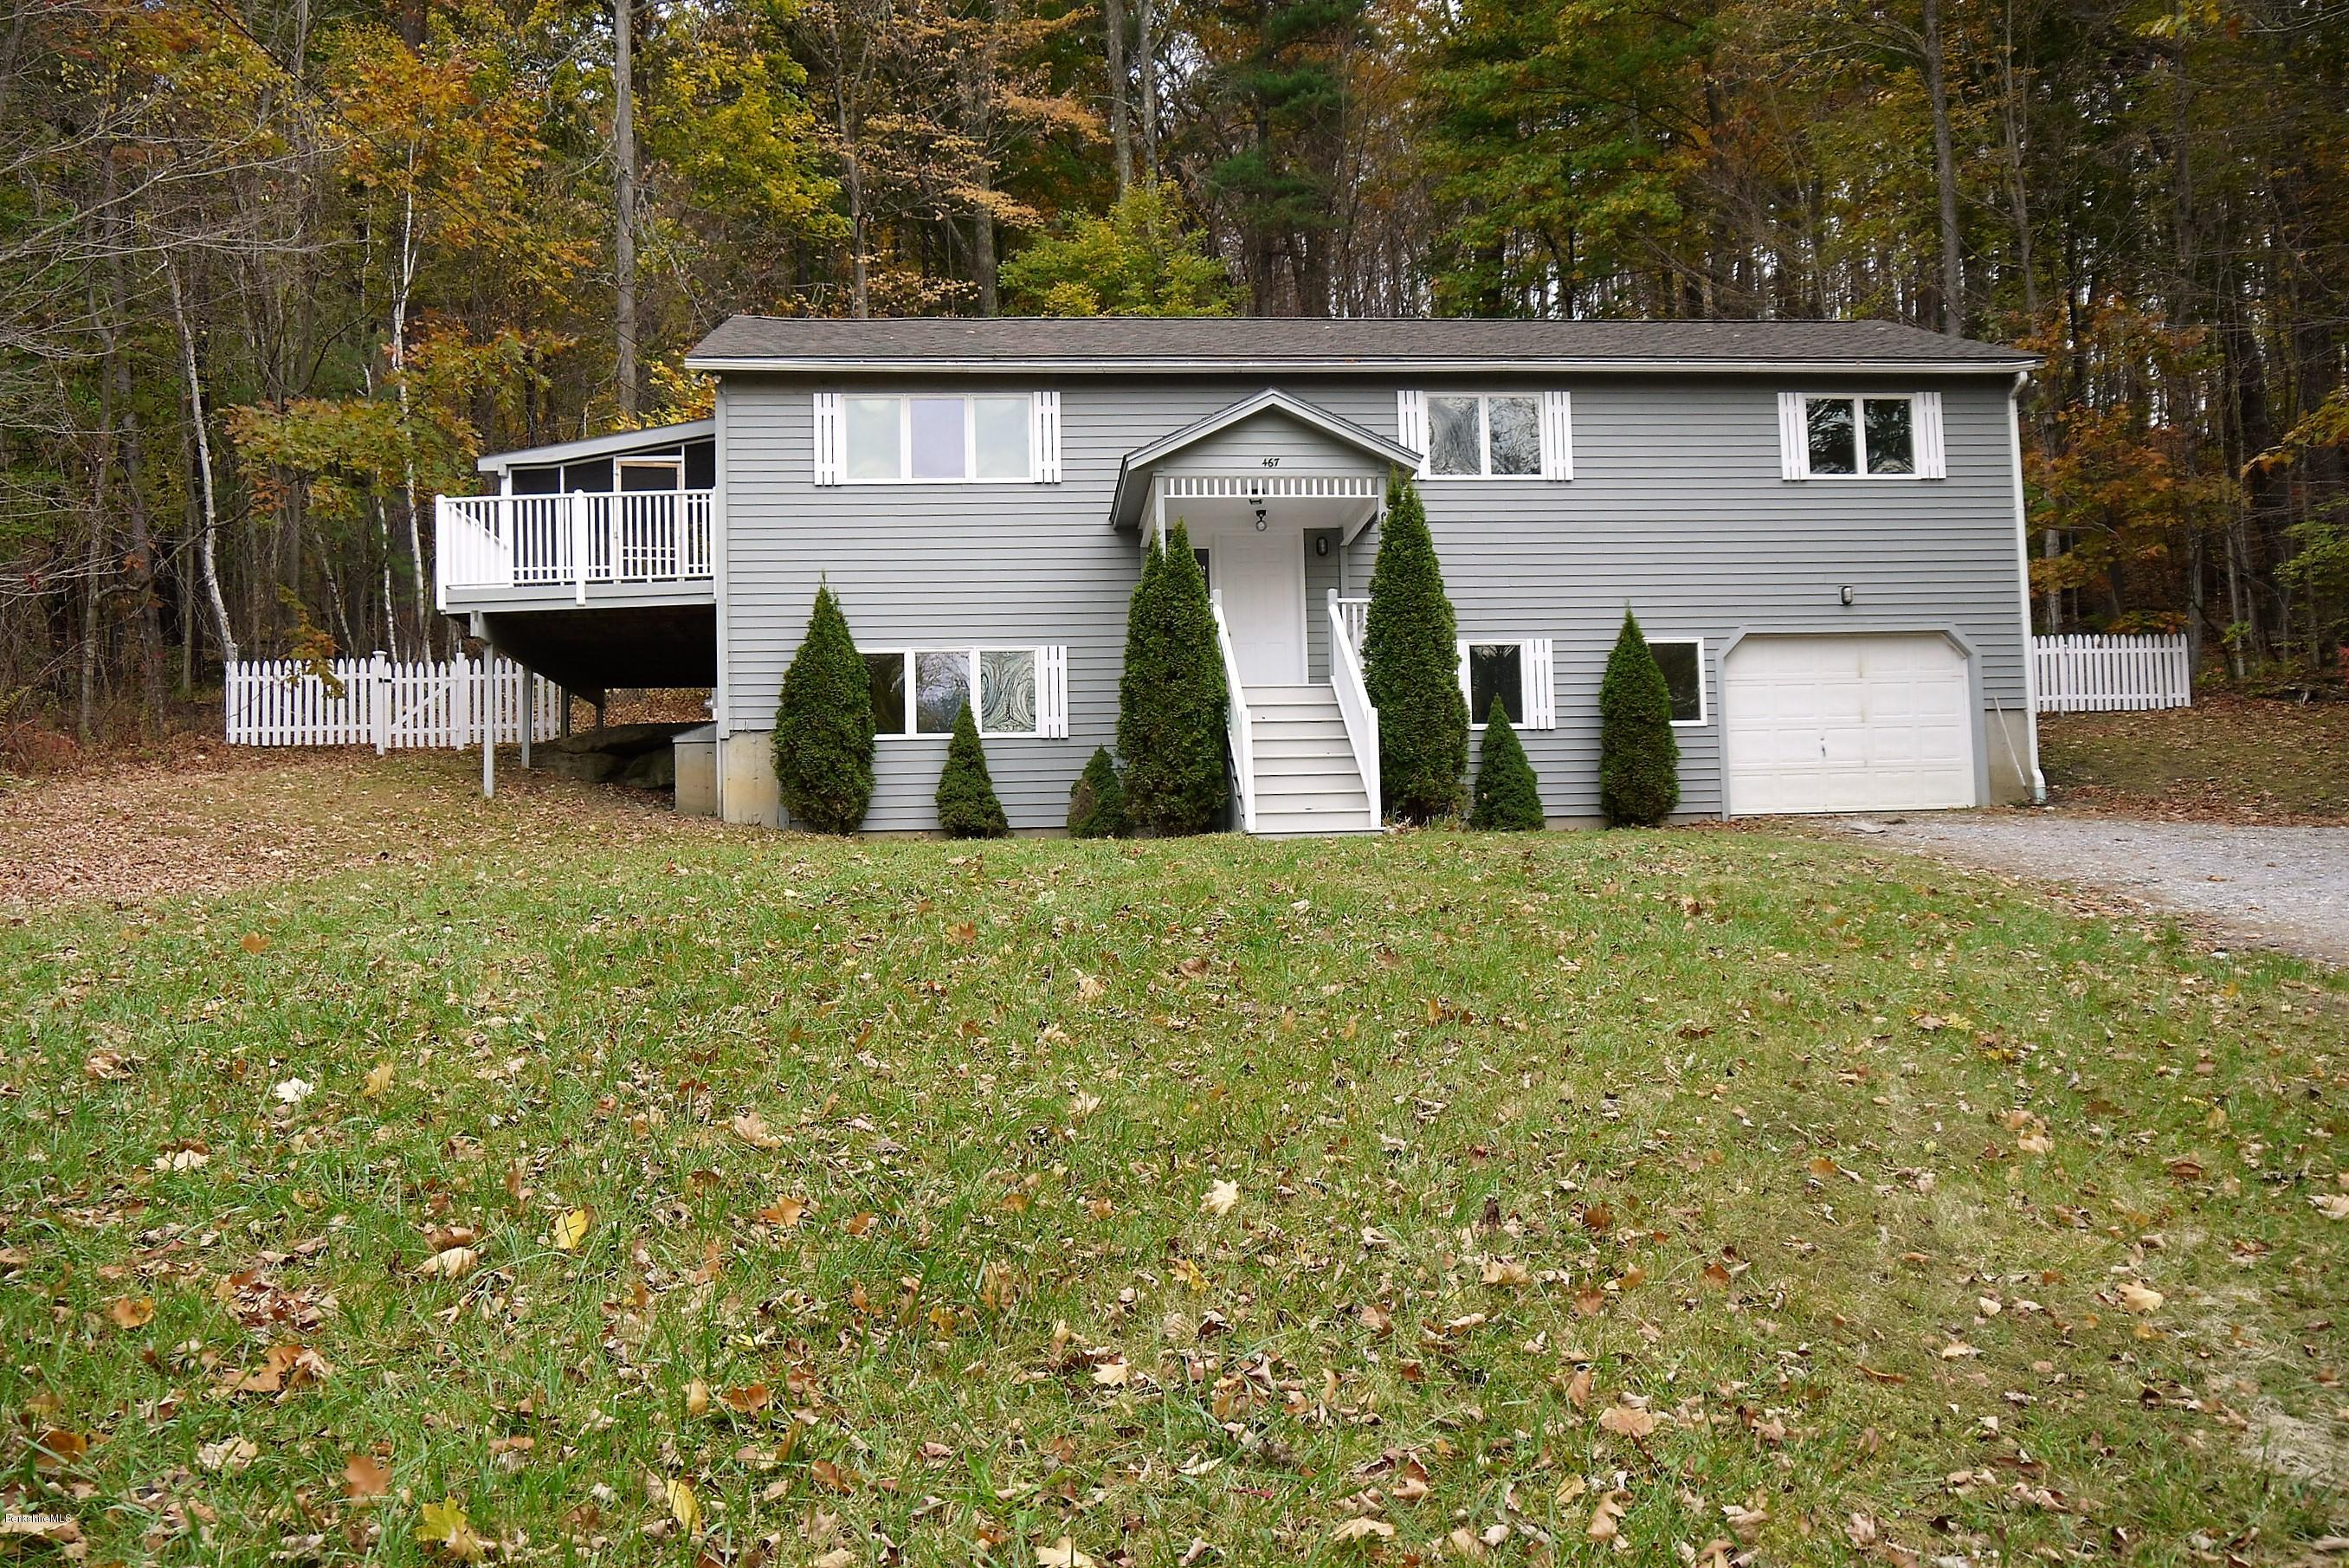 467 Undermountain , Lenox MA Real Estate Listing   MLS# 217426